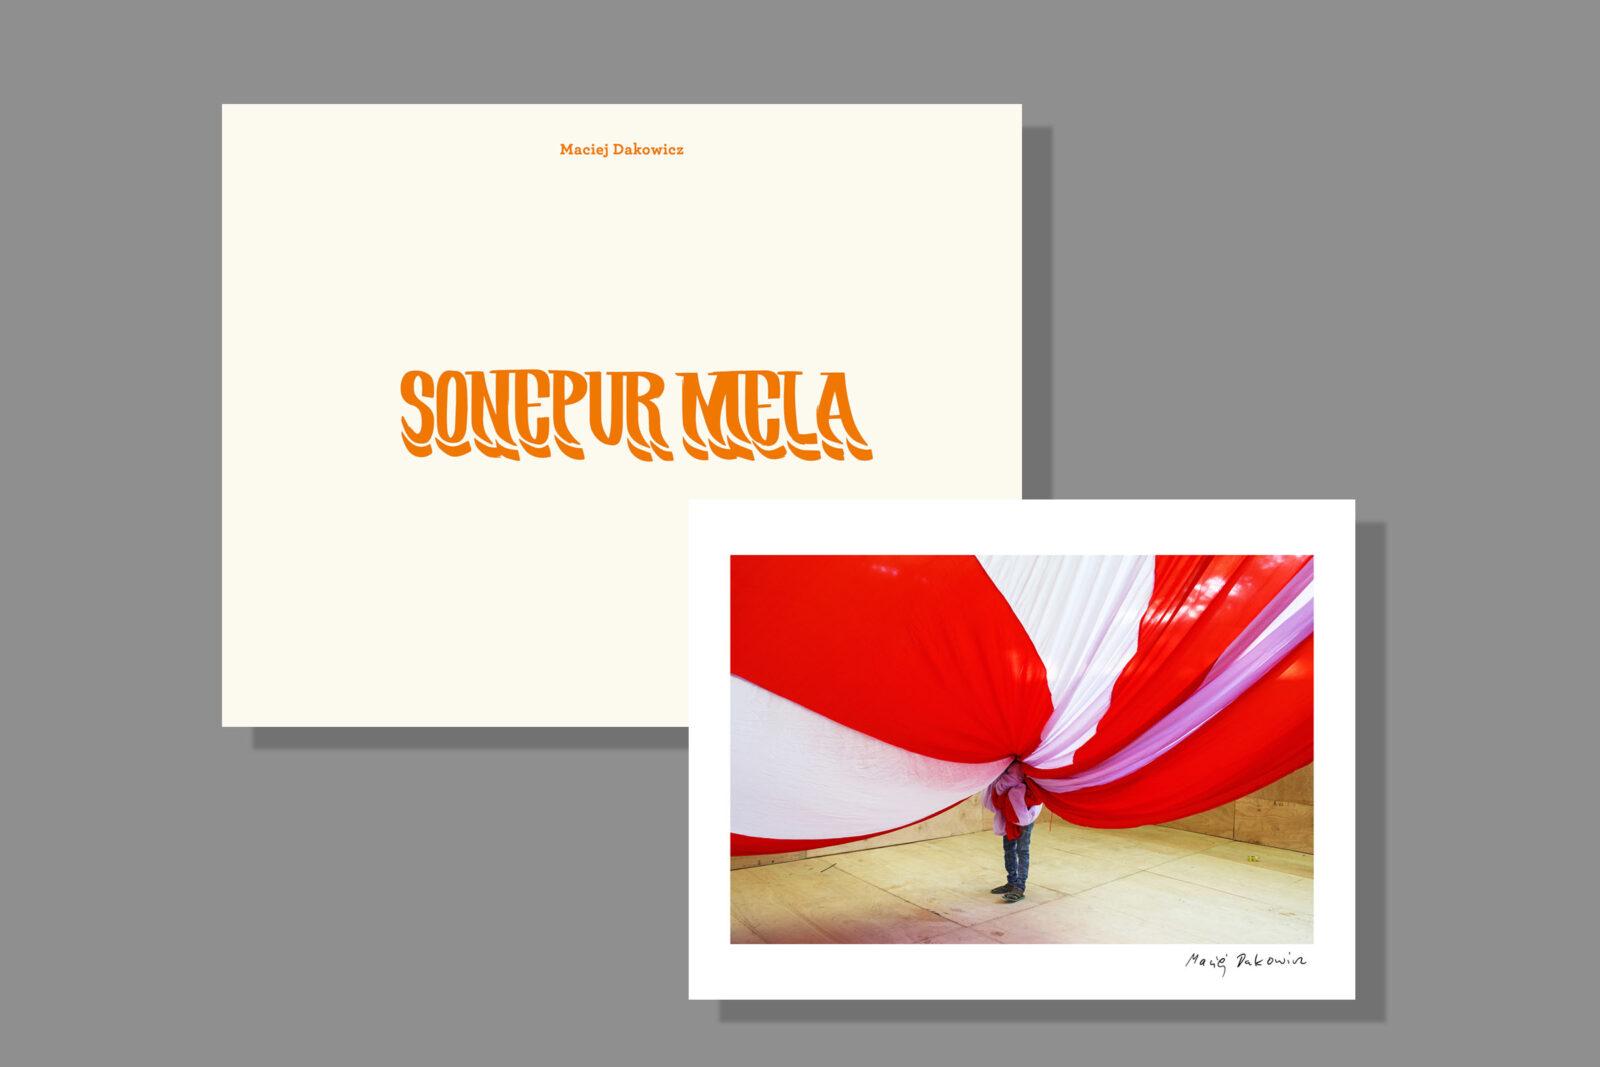 book_Sonepur_Mela_Maciej_Dakowicz_cover_special_edition_2021_orange_prints_1-1600x1067.jpg